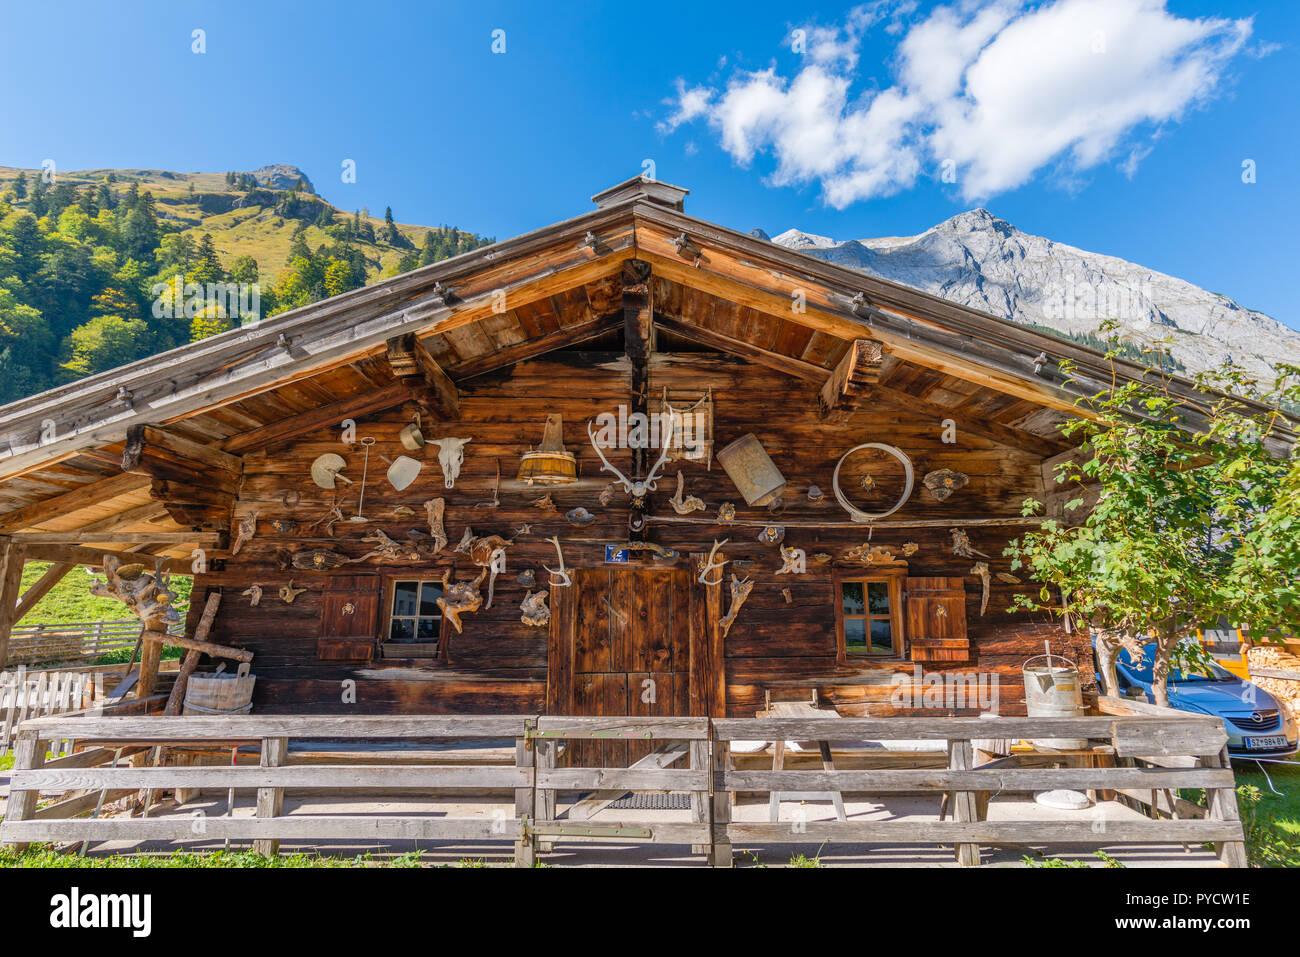 Alp in Engtal or Narrow Valley, Maple Valley, Grosser Ahornboden, Great Maple Ground, Eng, Hinterriss, Karwendel, the Alps, Tyrol, Austria - Stock Image